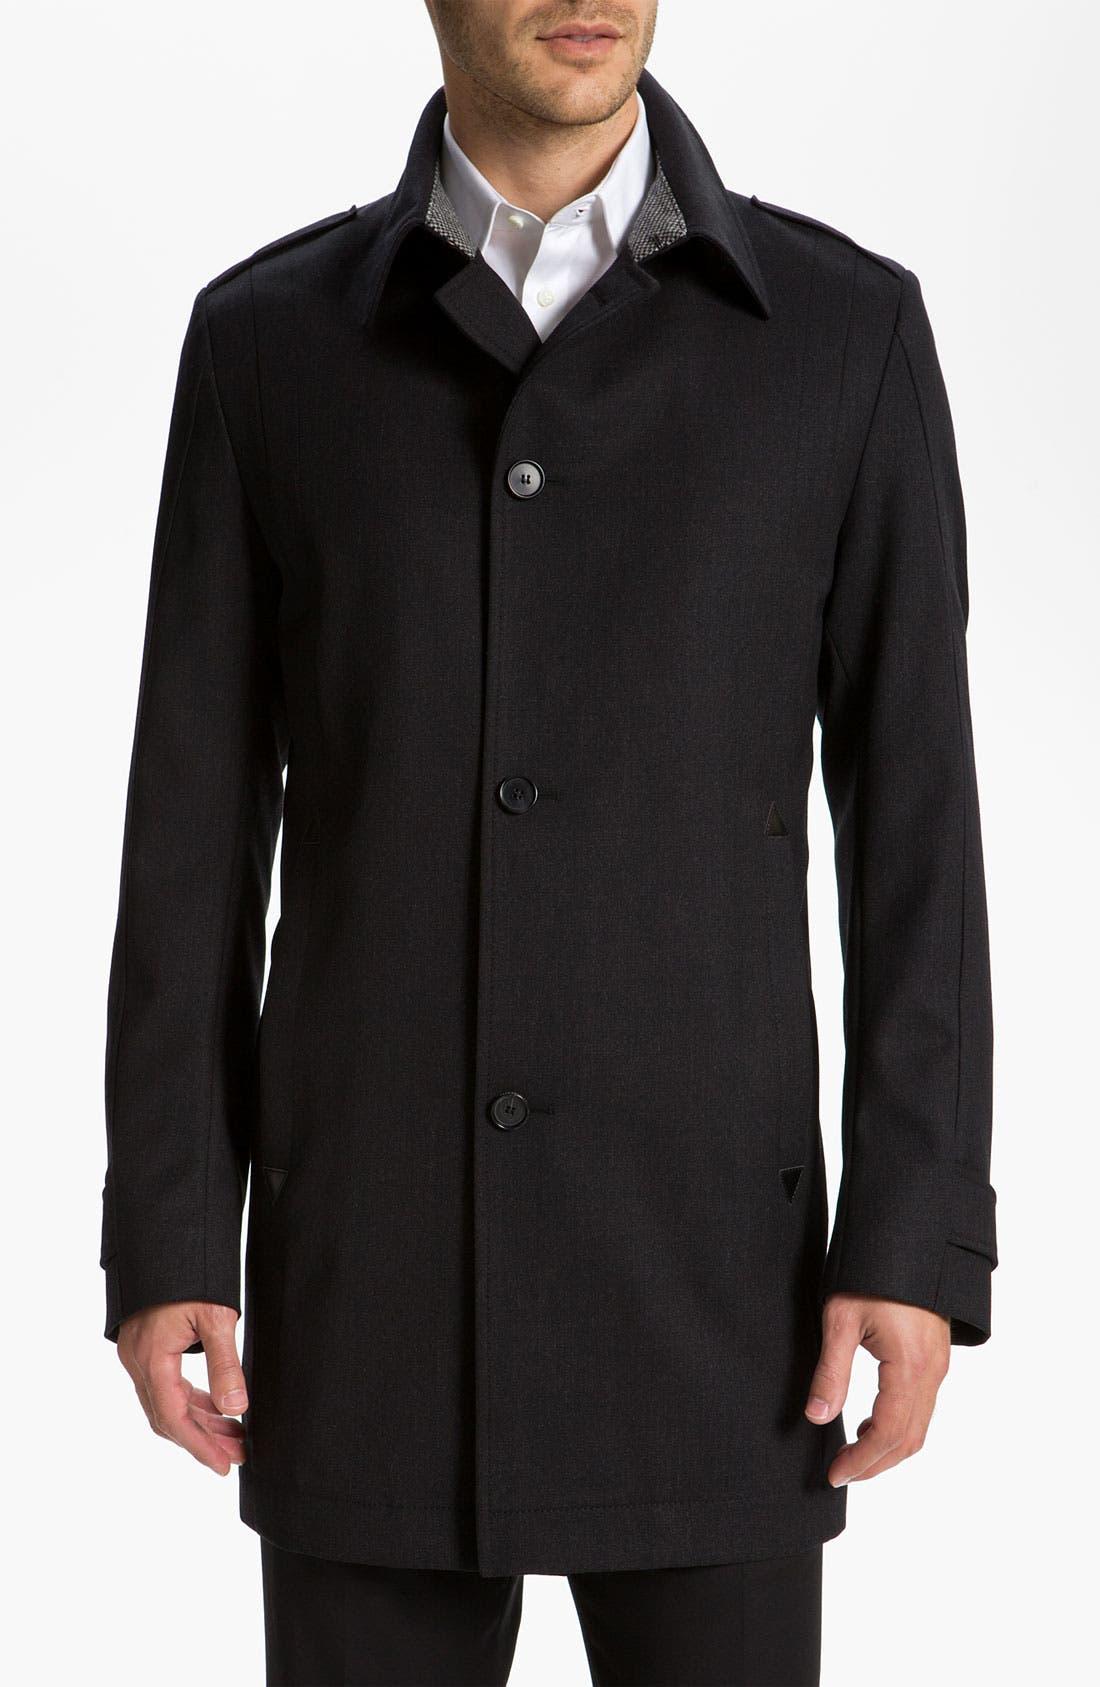 Alternate Image 1 Selected - BOSS Black 'Daze' Top Coat